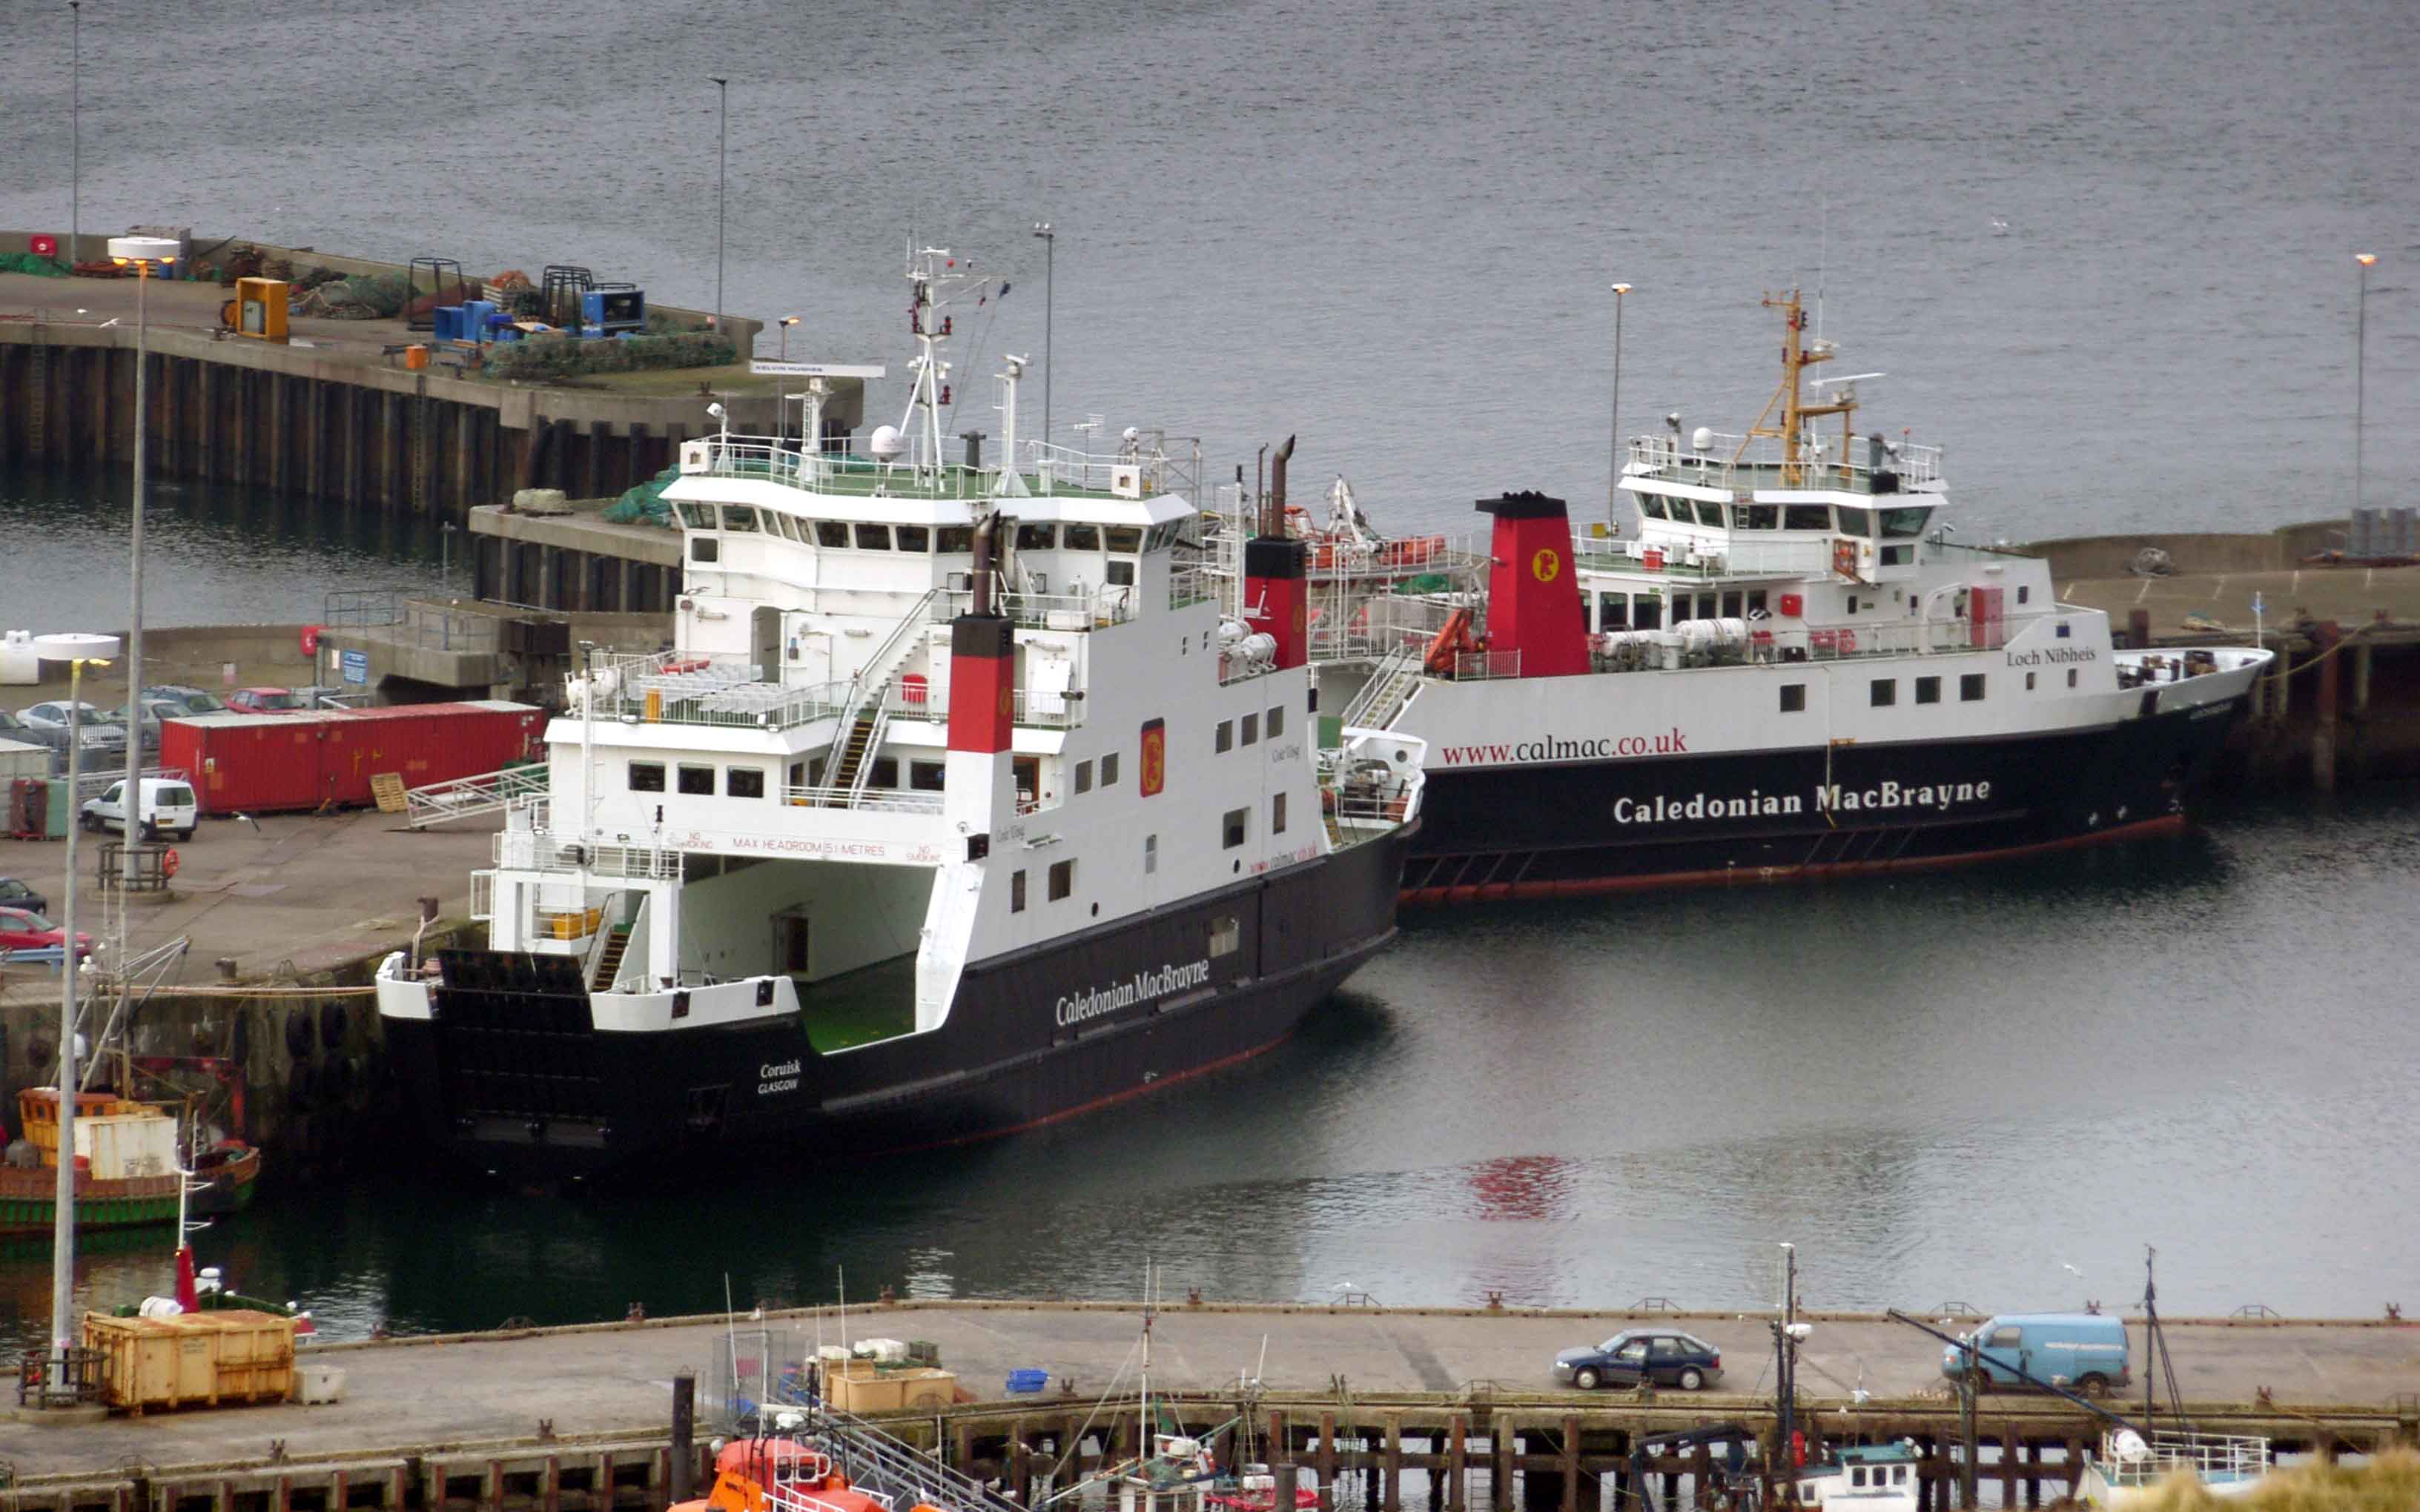 Coruisk with Lochnevis at Mallaig (Ships of CalMac)